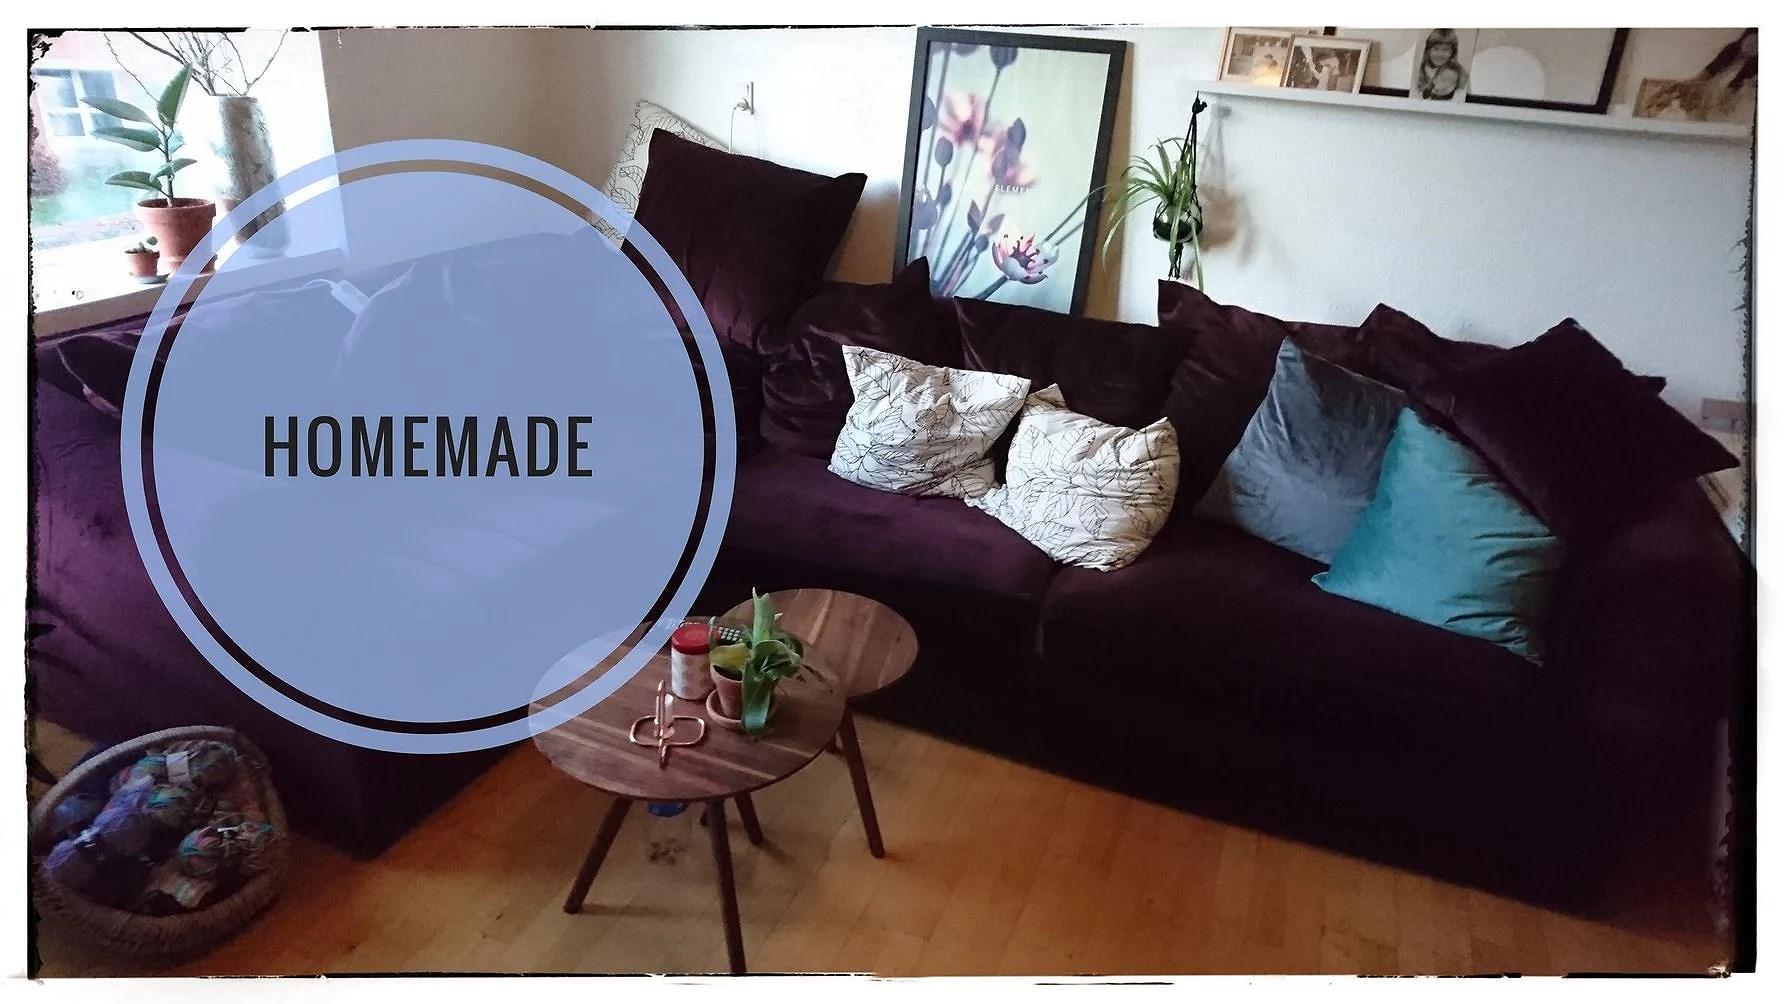 Homemade ny sofa. Sådan næsten ihvertfald.